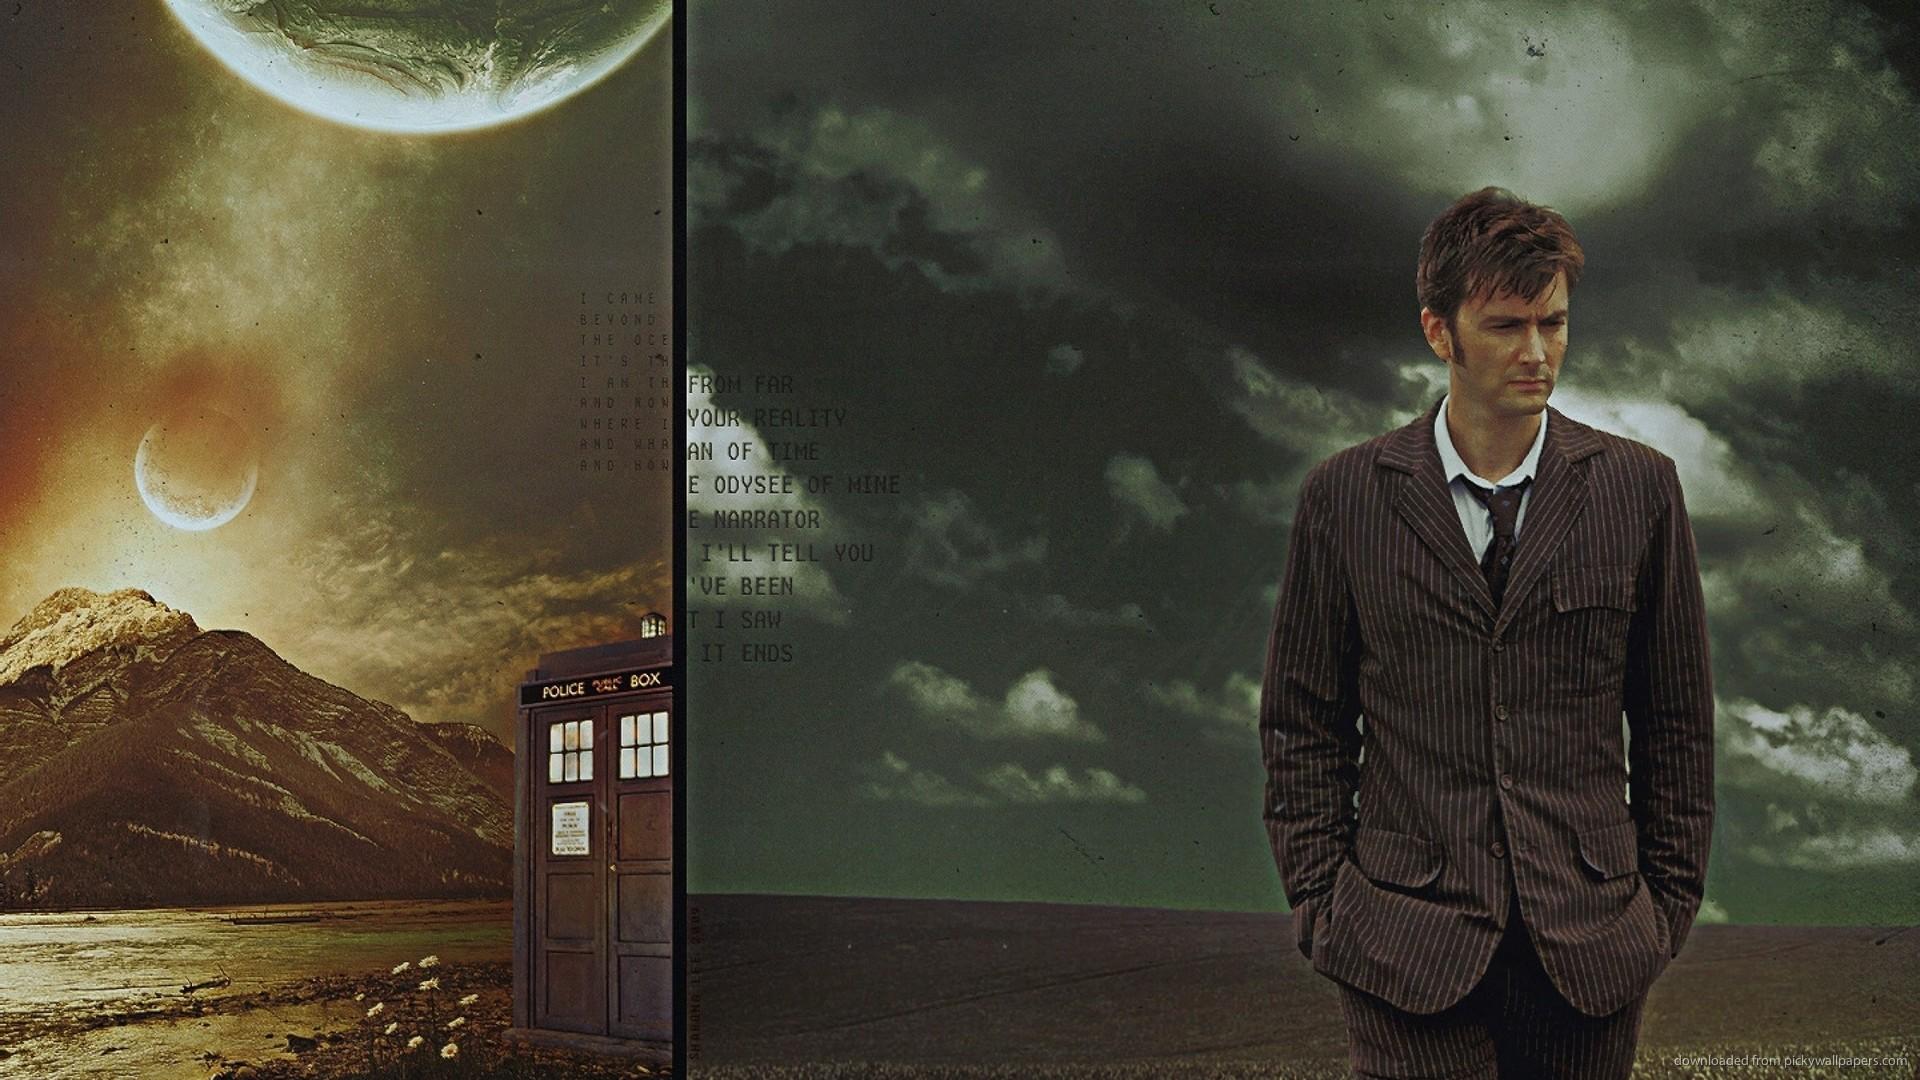 HD David Tennant Doctor Who Wallpaper 1920x1080